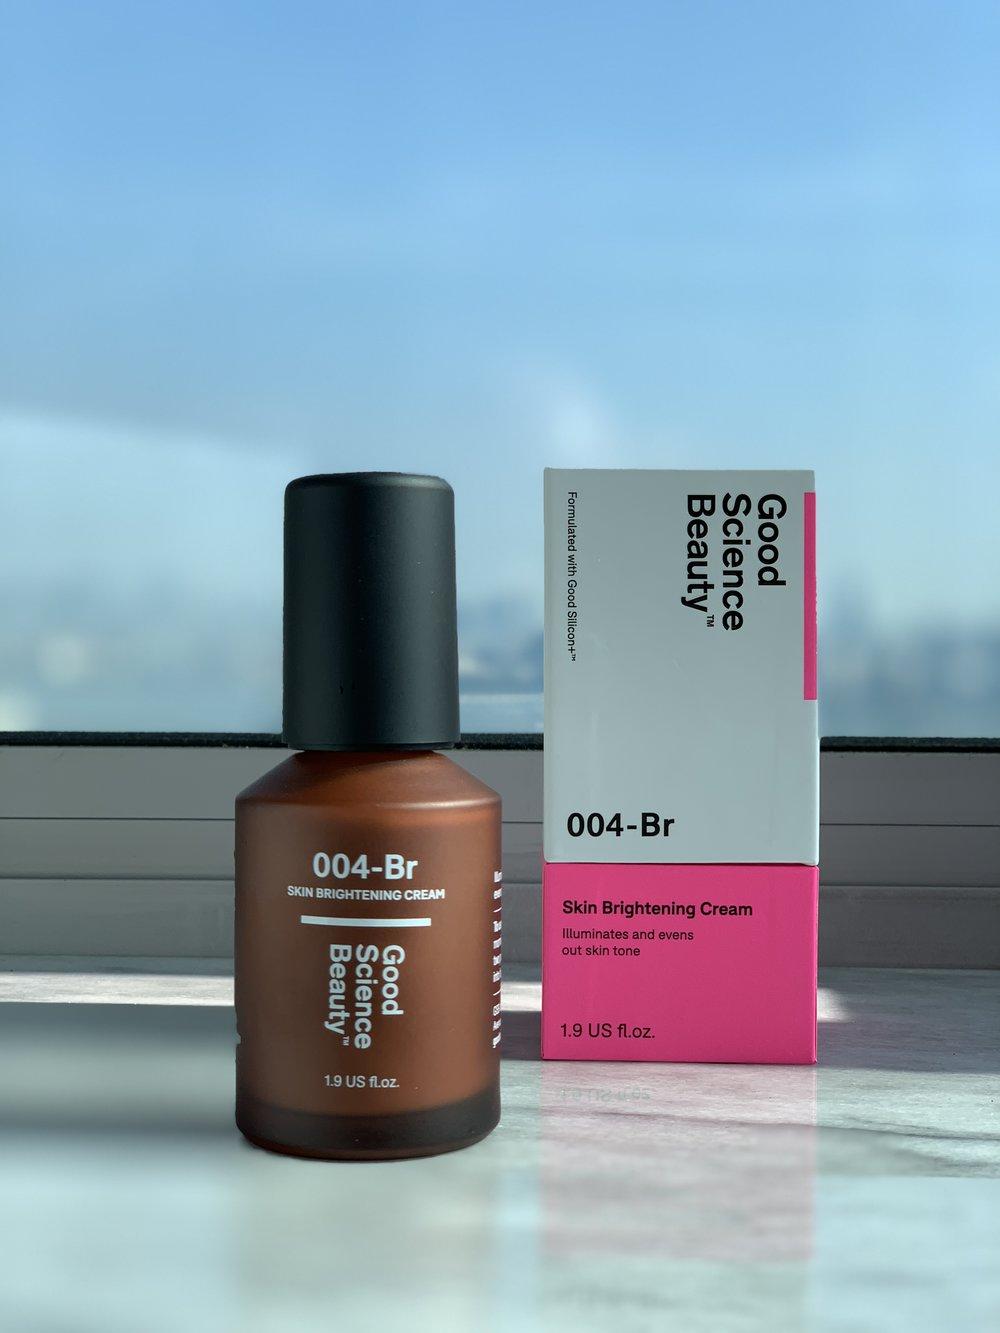 The Good Science Beauty Skin Brightening Cream.